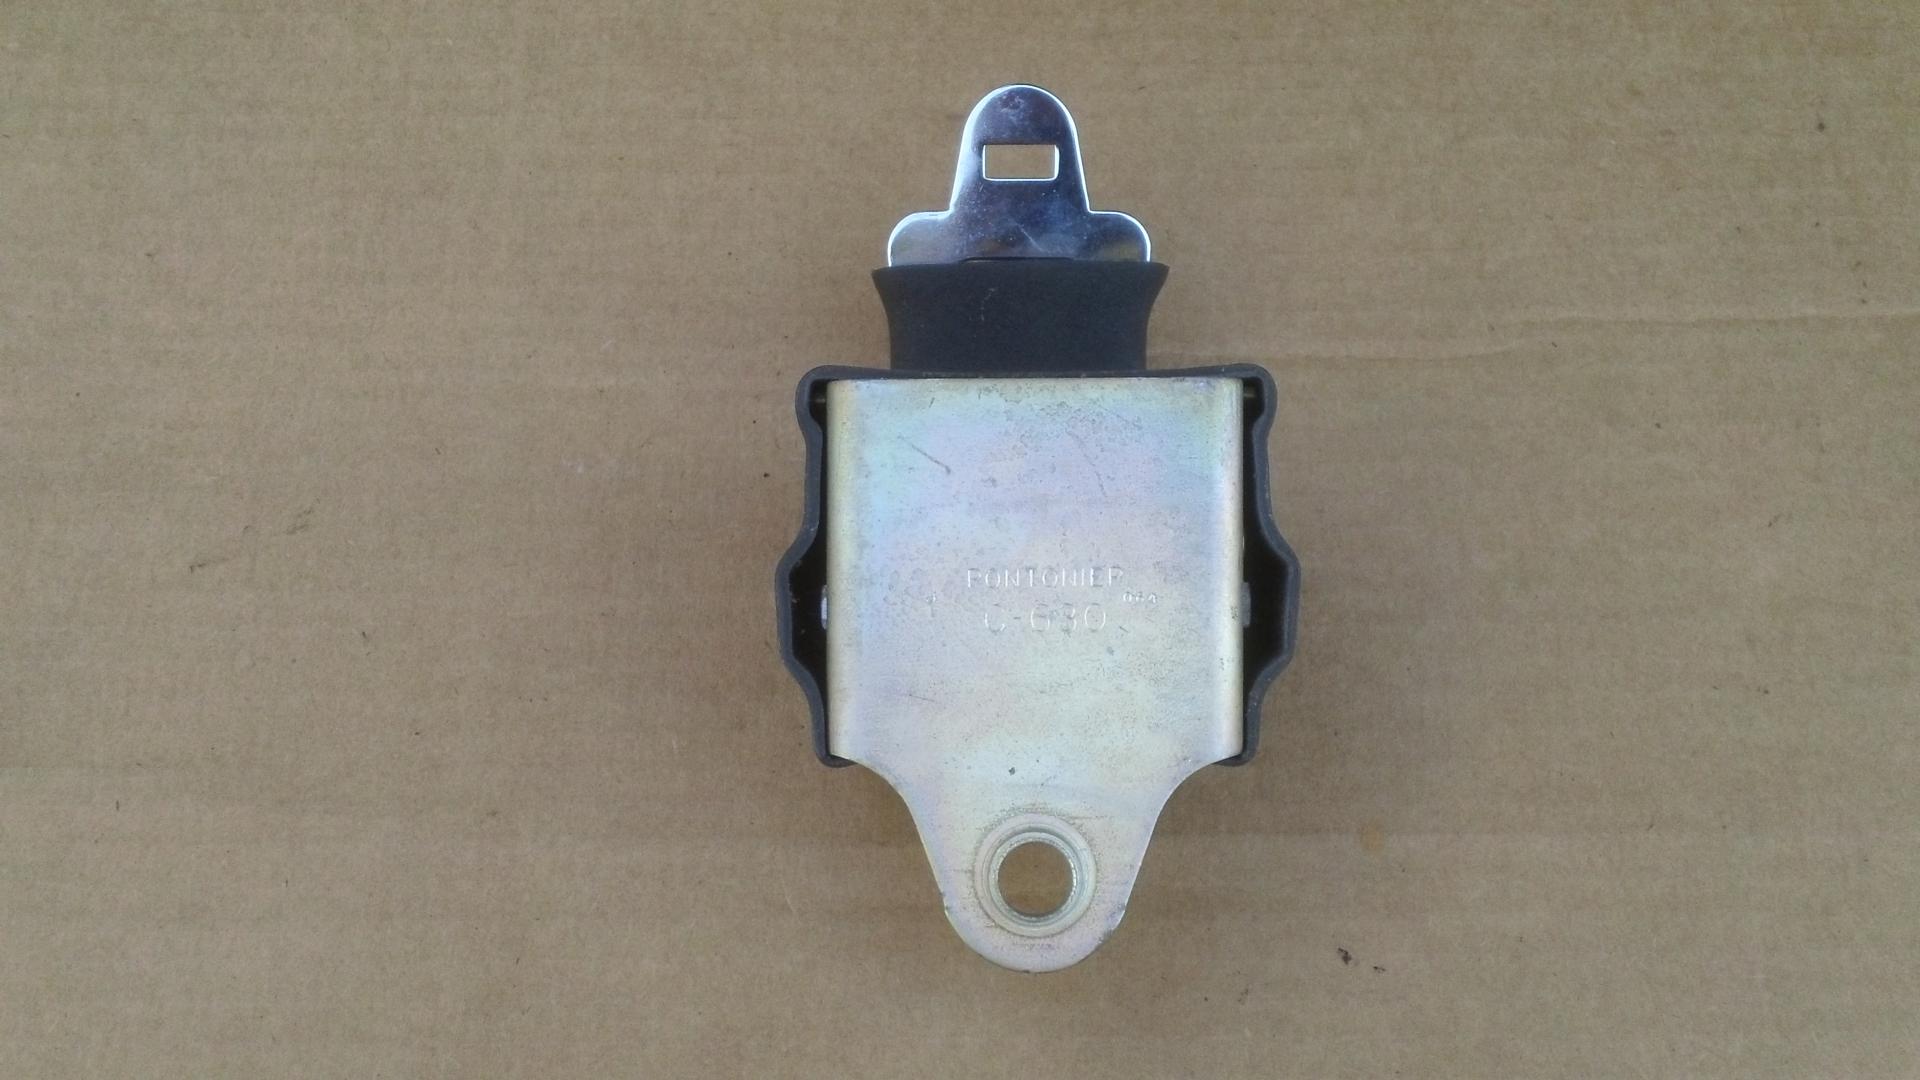 1973 dodge charger seat belt wiring diagram cigarette lighter fuse nos plymouth roadrunner satellite rear